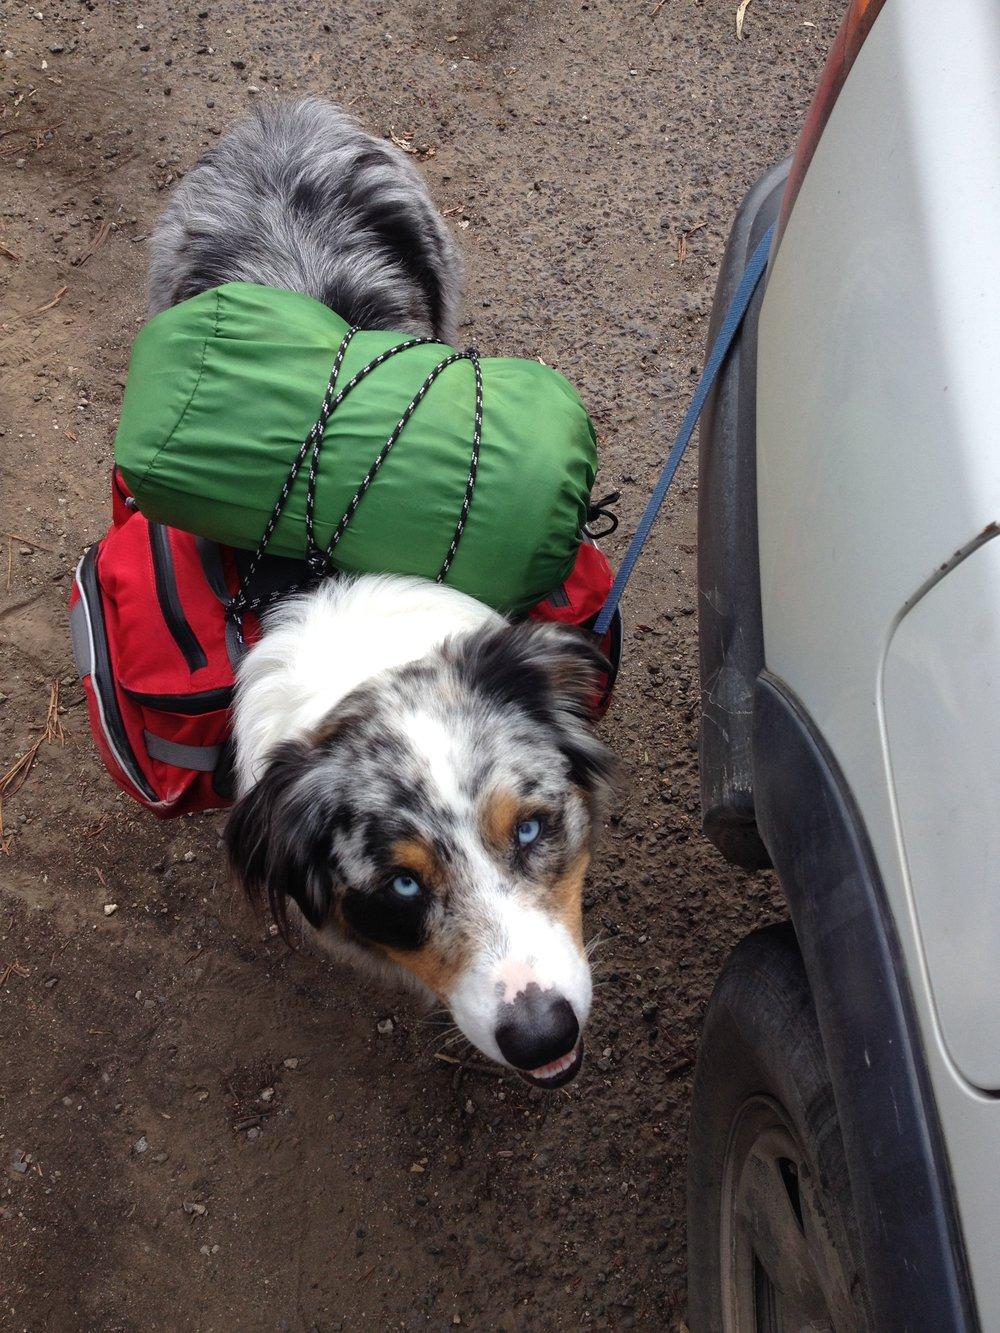 Loki the Australian Shepherd ready for adventure.